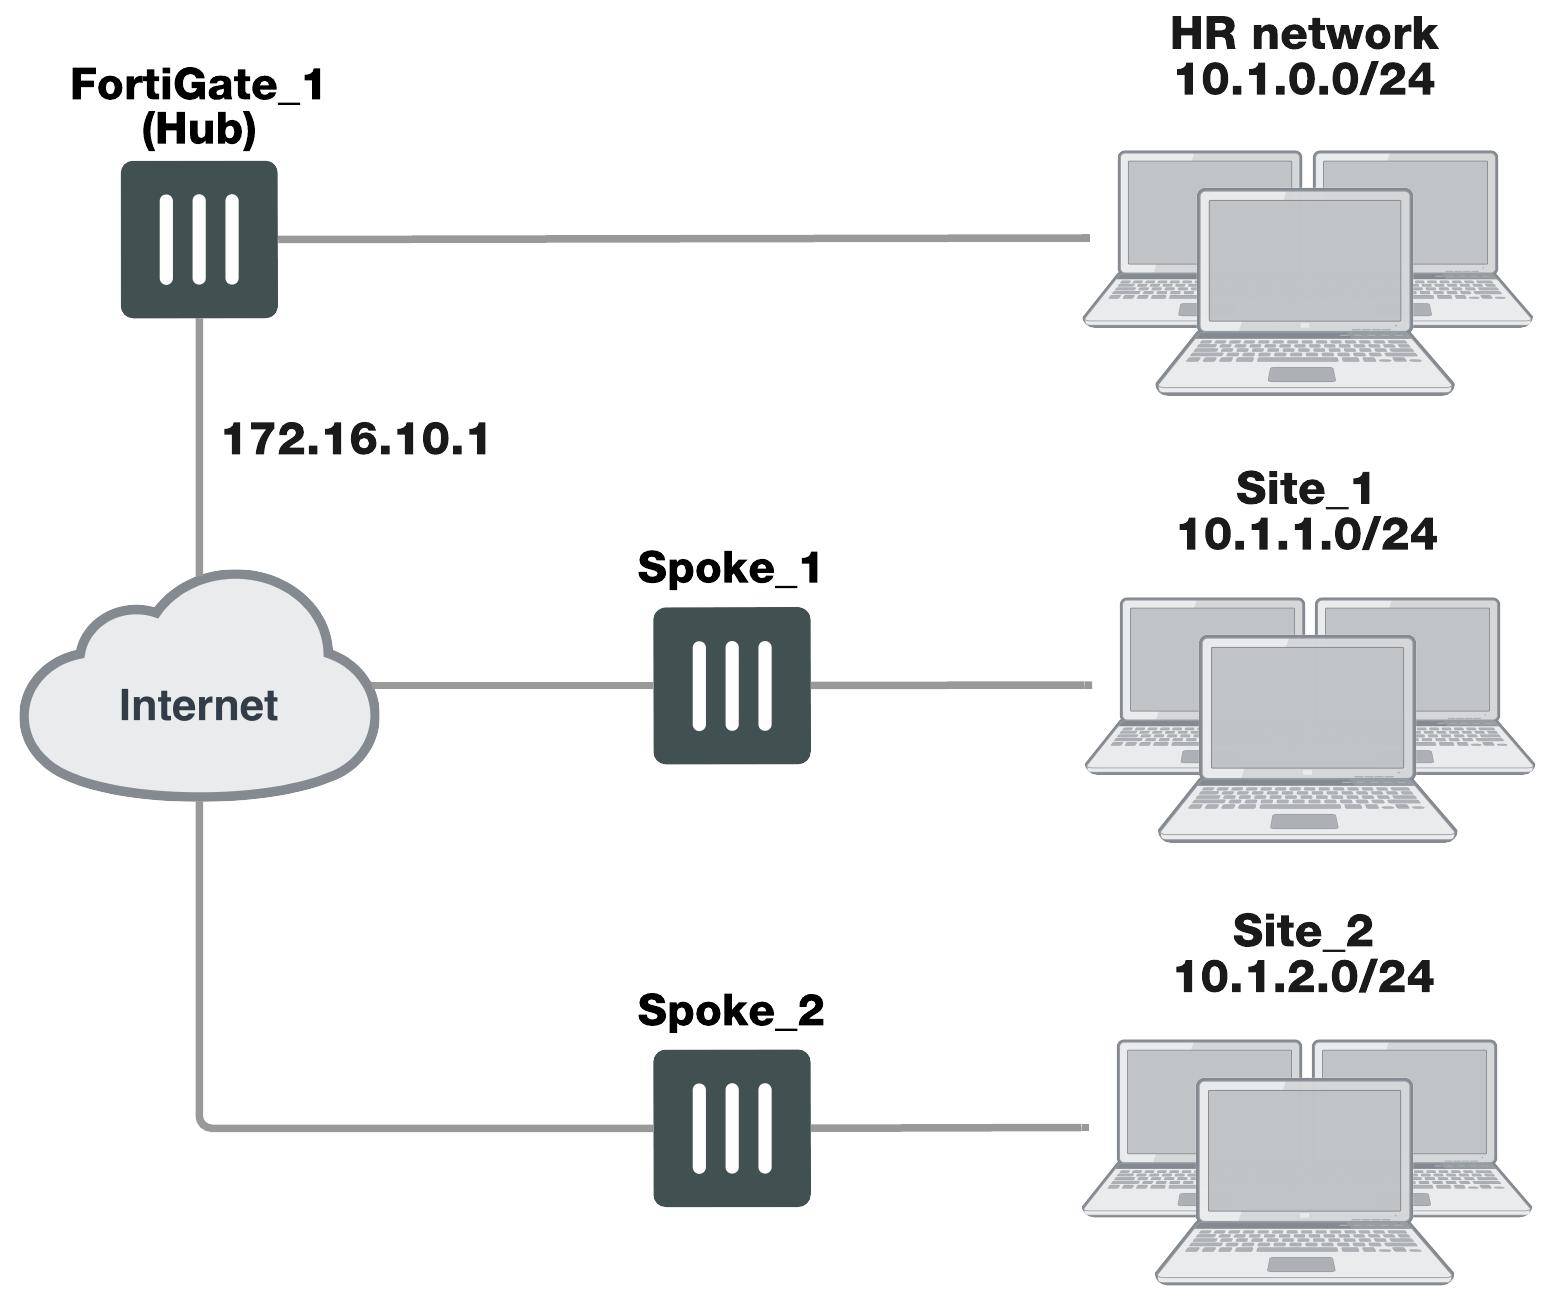 Dynamic spokes configuration example